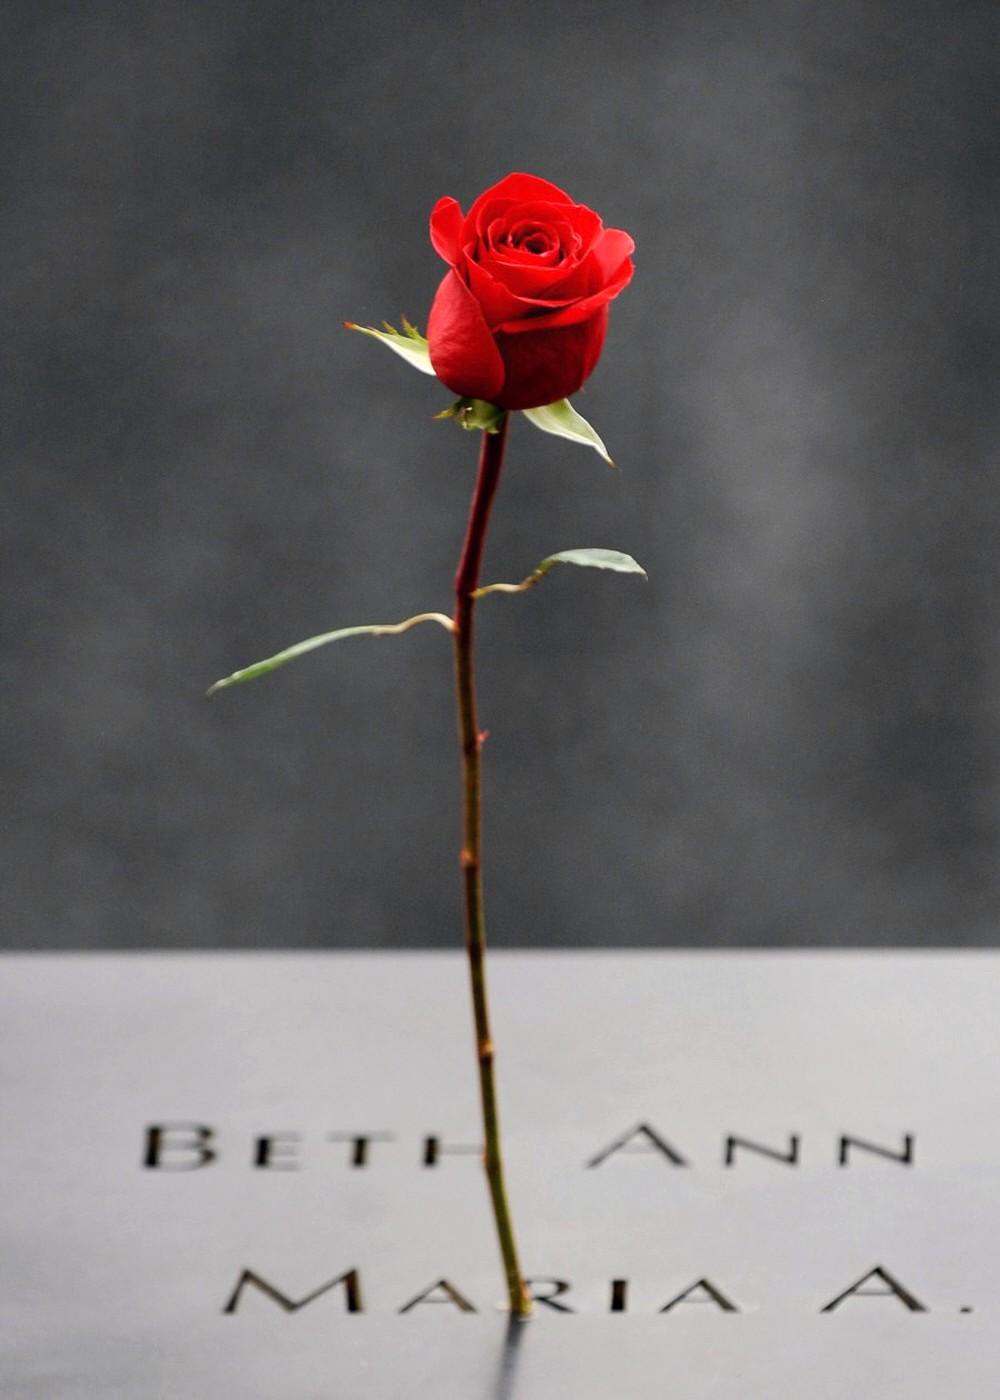 00.0g 9.11 Remembered. World Trade Center. 12.09.12